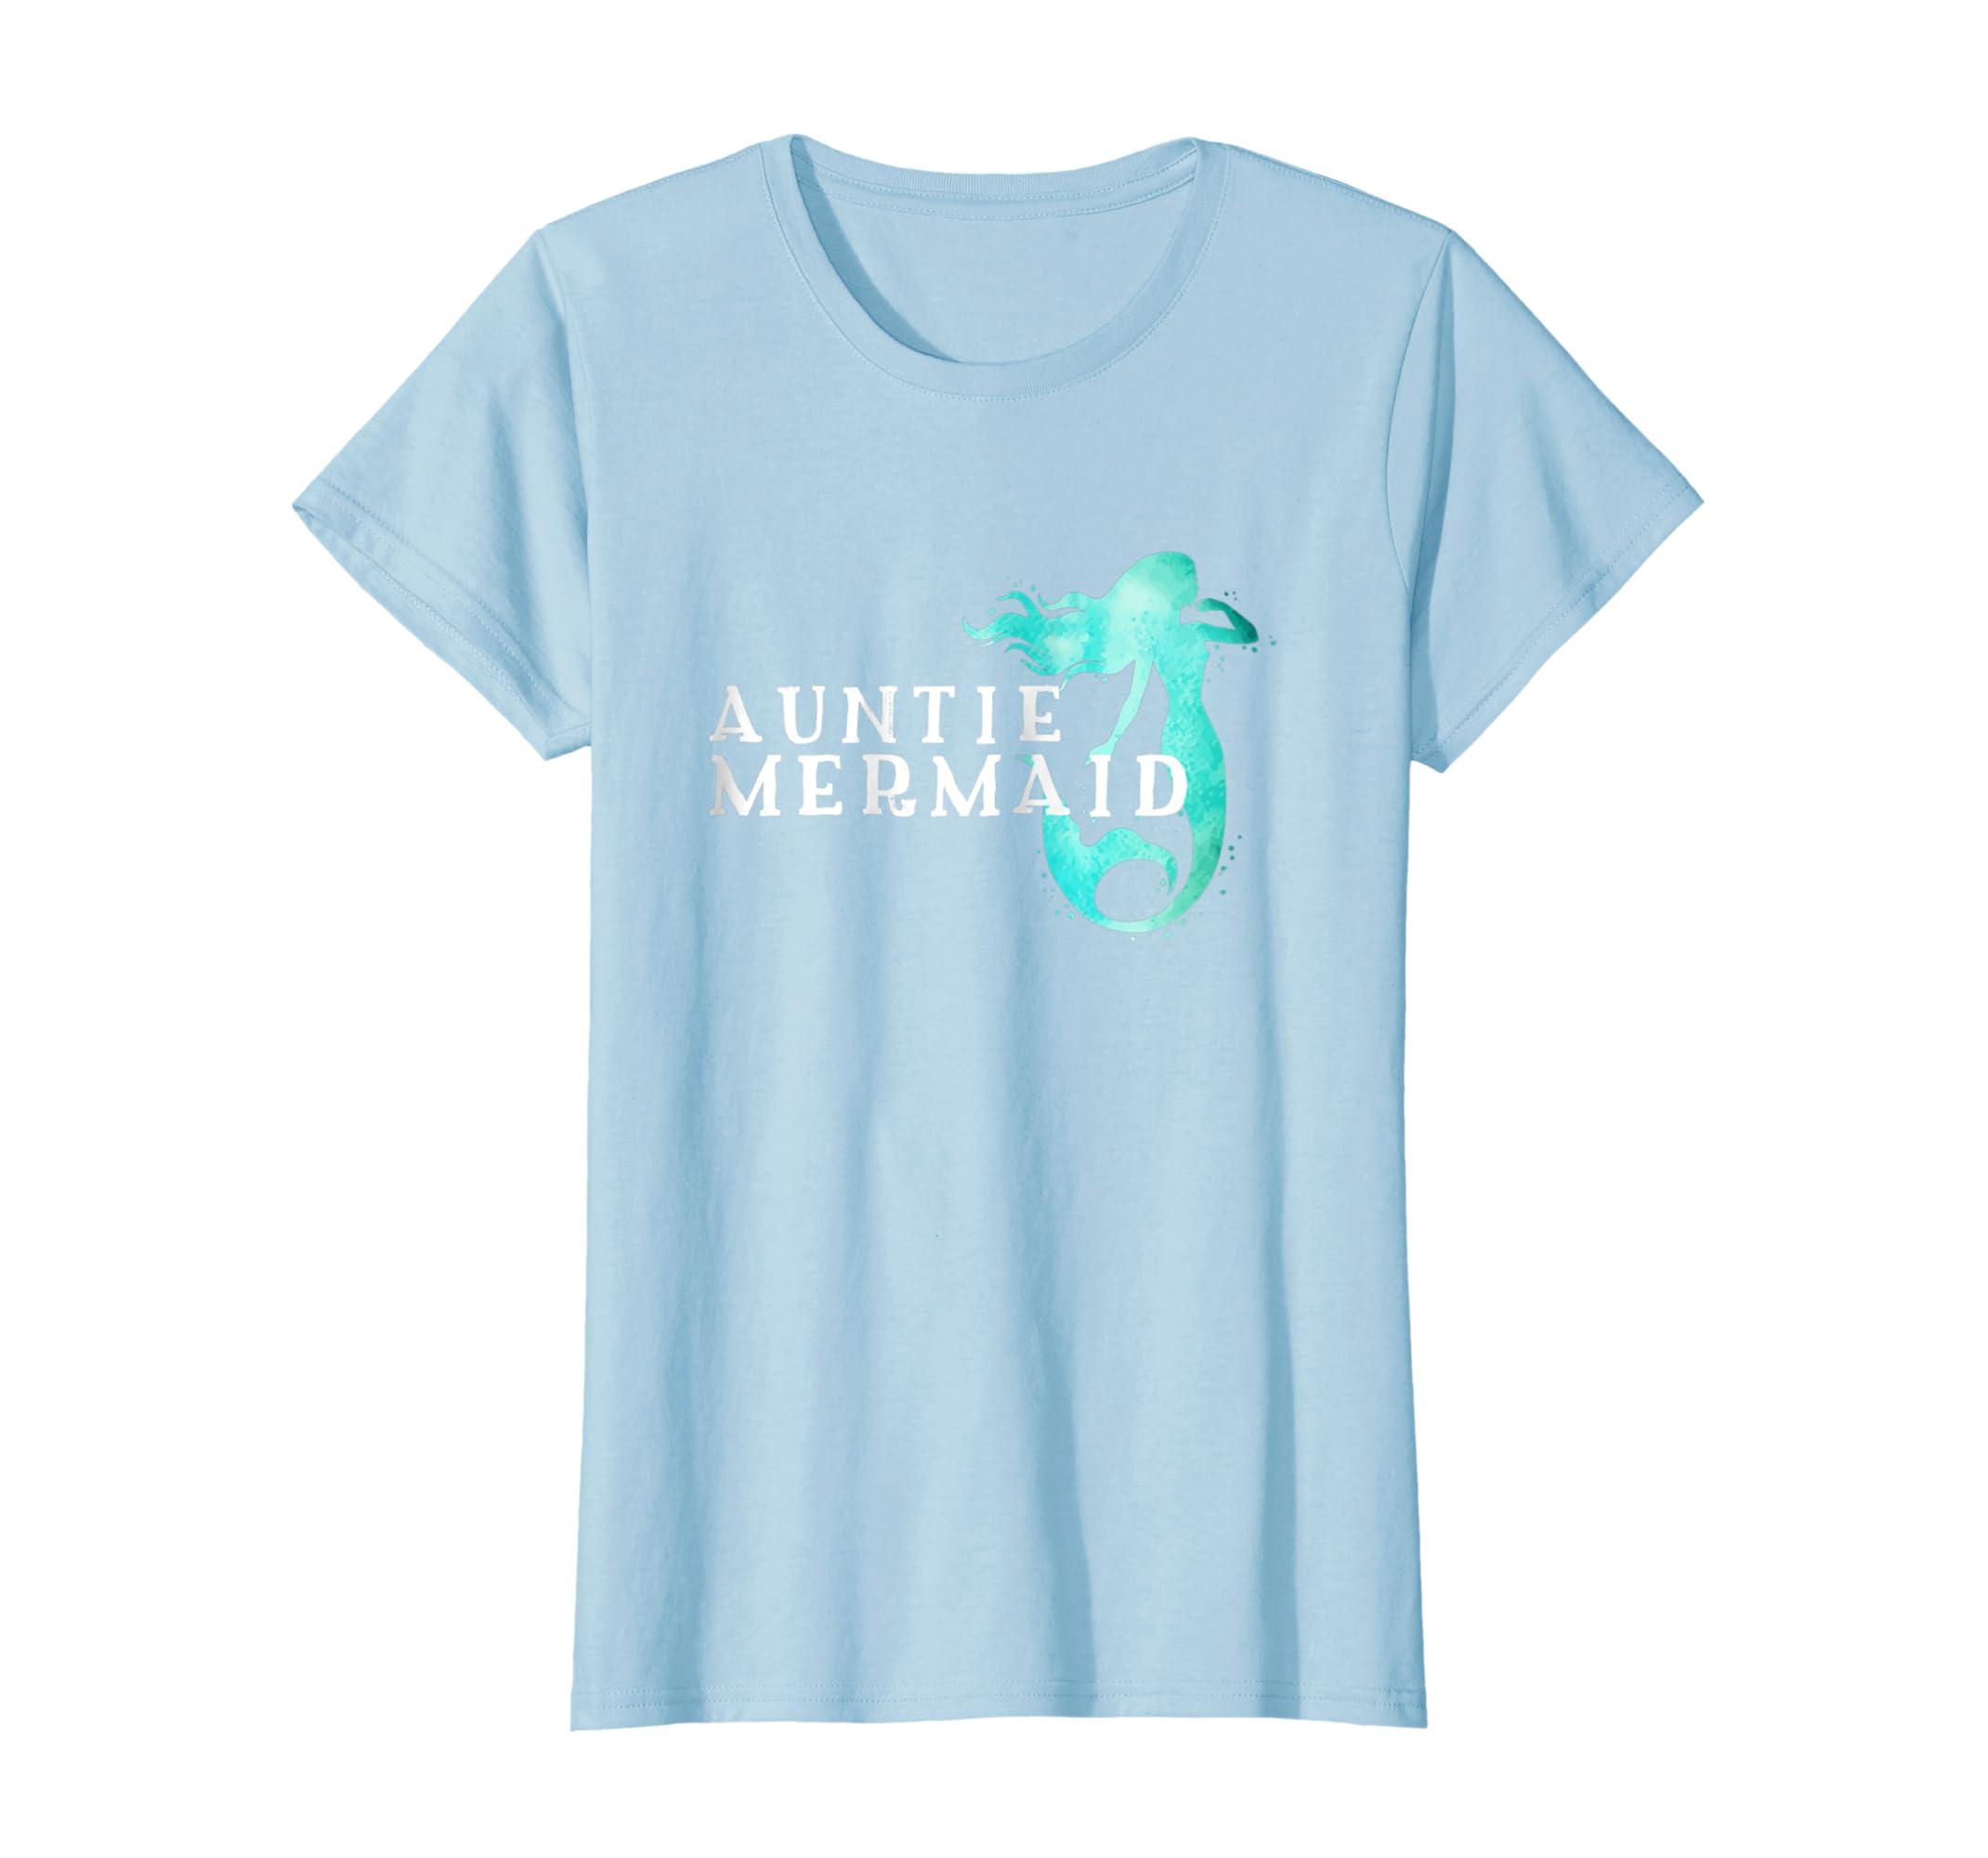 3f027783b Amazon.com: Womens Auntie Mermaid T shirt, Awsome tee, Amazing tee, Cute tee:  Clothing